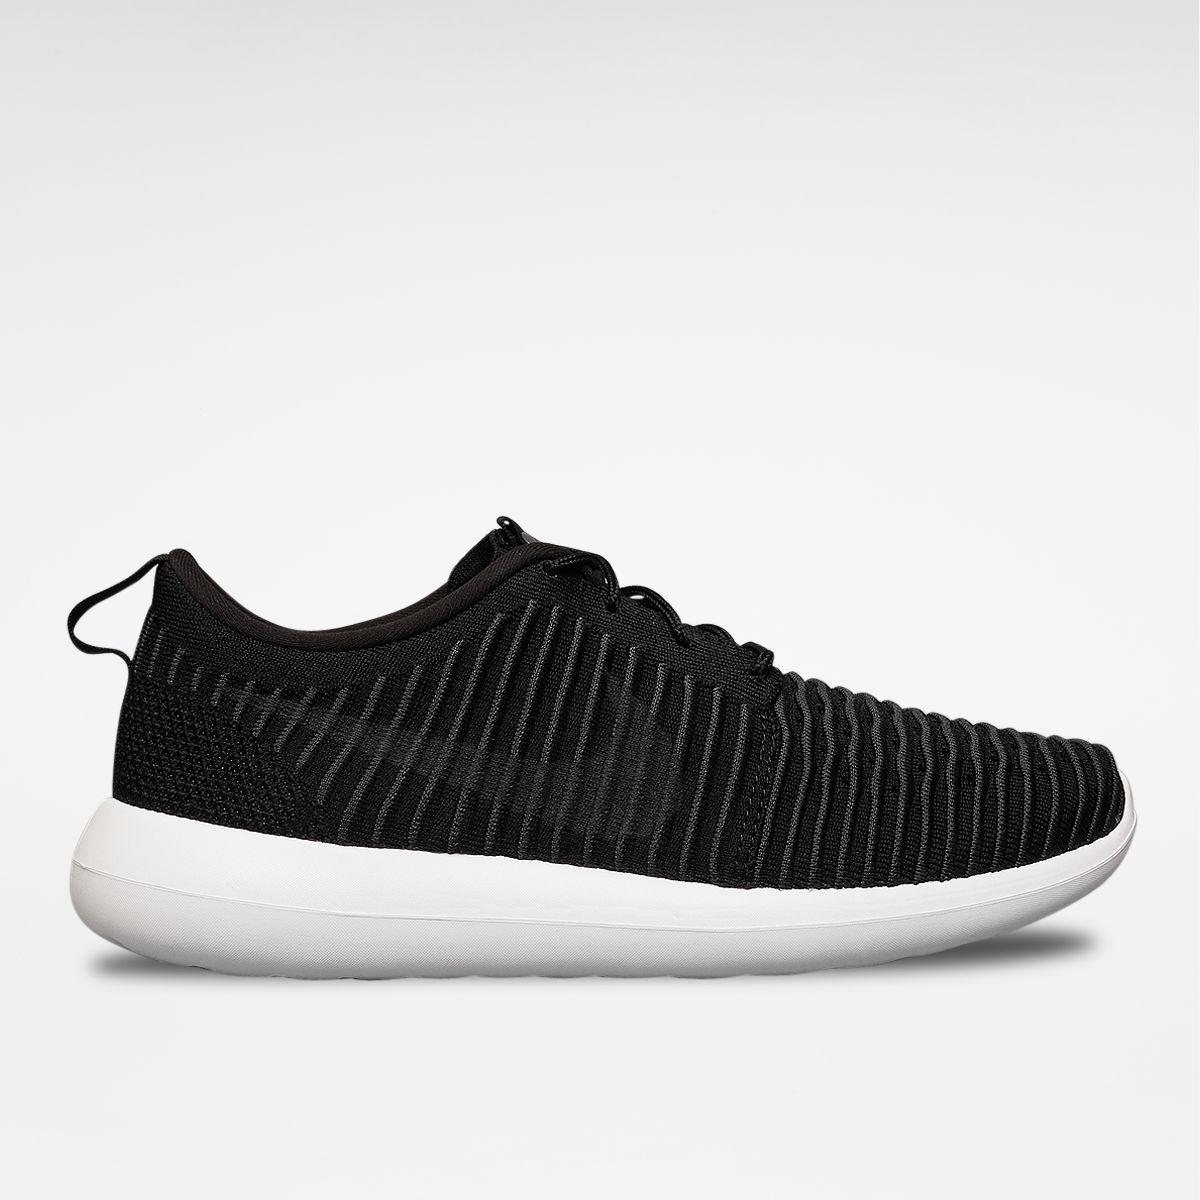 Nike Roshe Two Flyknit - Schwarz